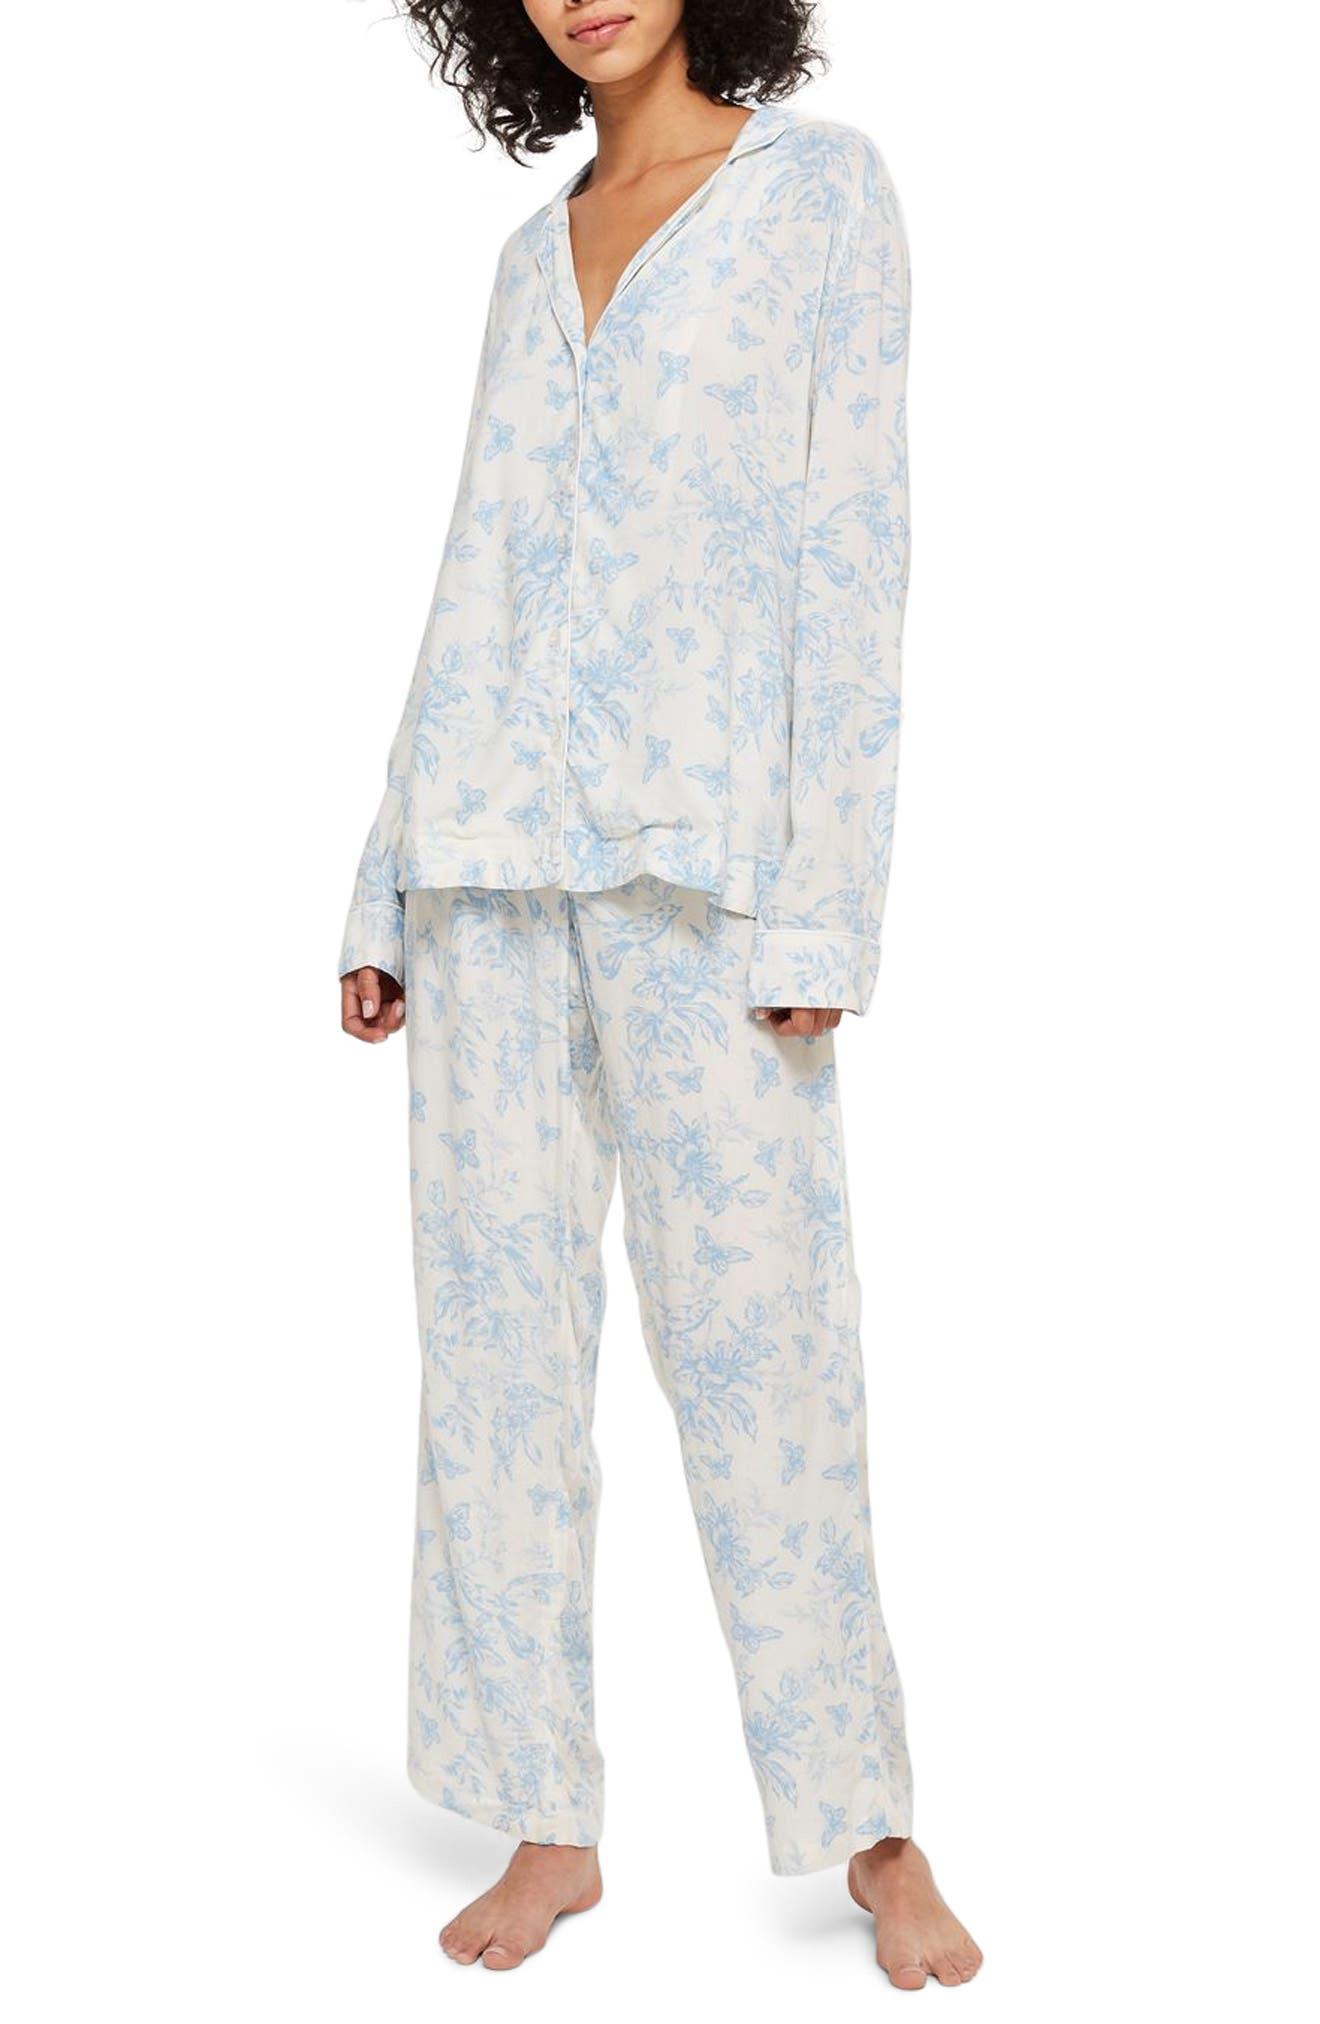 French Bird Pajamas,                             Main thumbnail 1, color,                             LIGHT BLUE